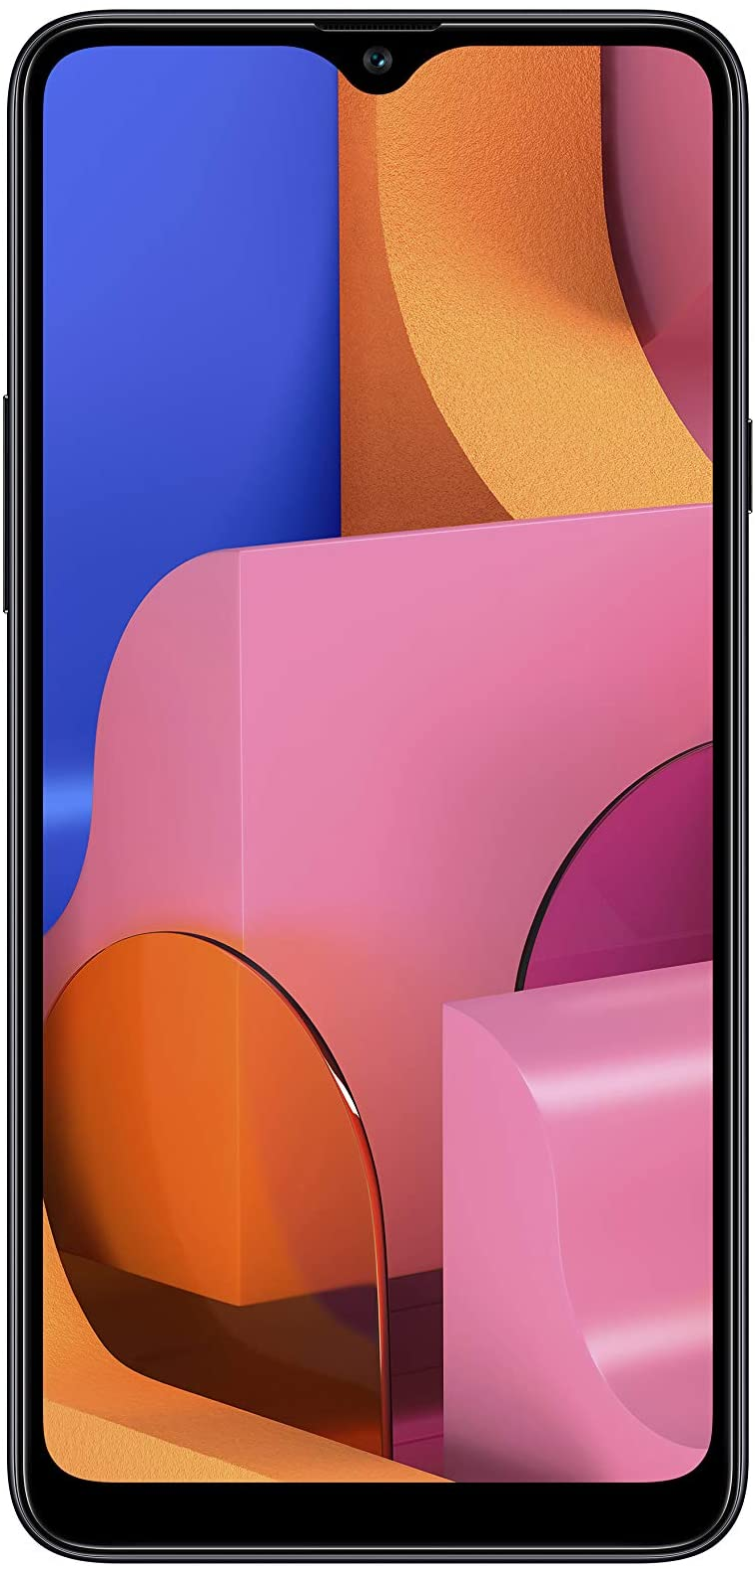 "Samsung Galaxy A20s (32GB 2GB RAM) 6.5"" HD+ Triple Camera SM-A207F/DS 4G LTE (AT&T Europe Asia Africa Cuba Digitel) Dual SIM GSM Factory Unlocked - International Version - No Warranty (Black)"